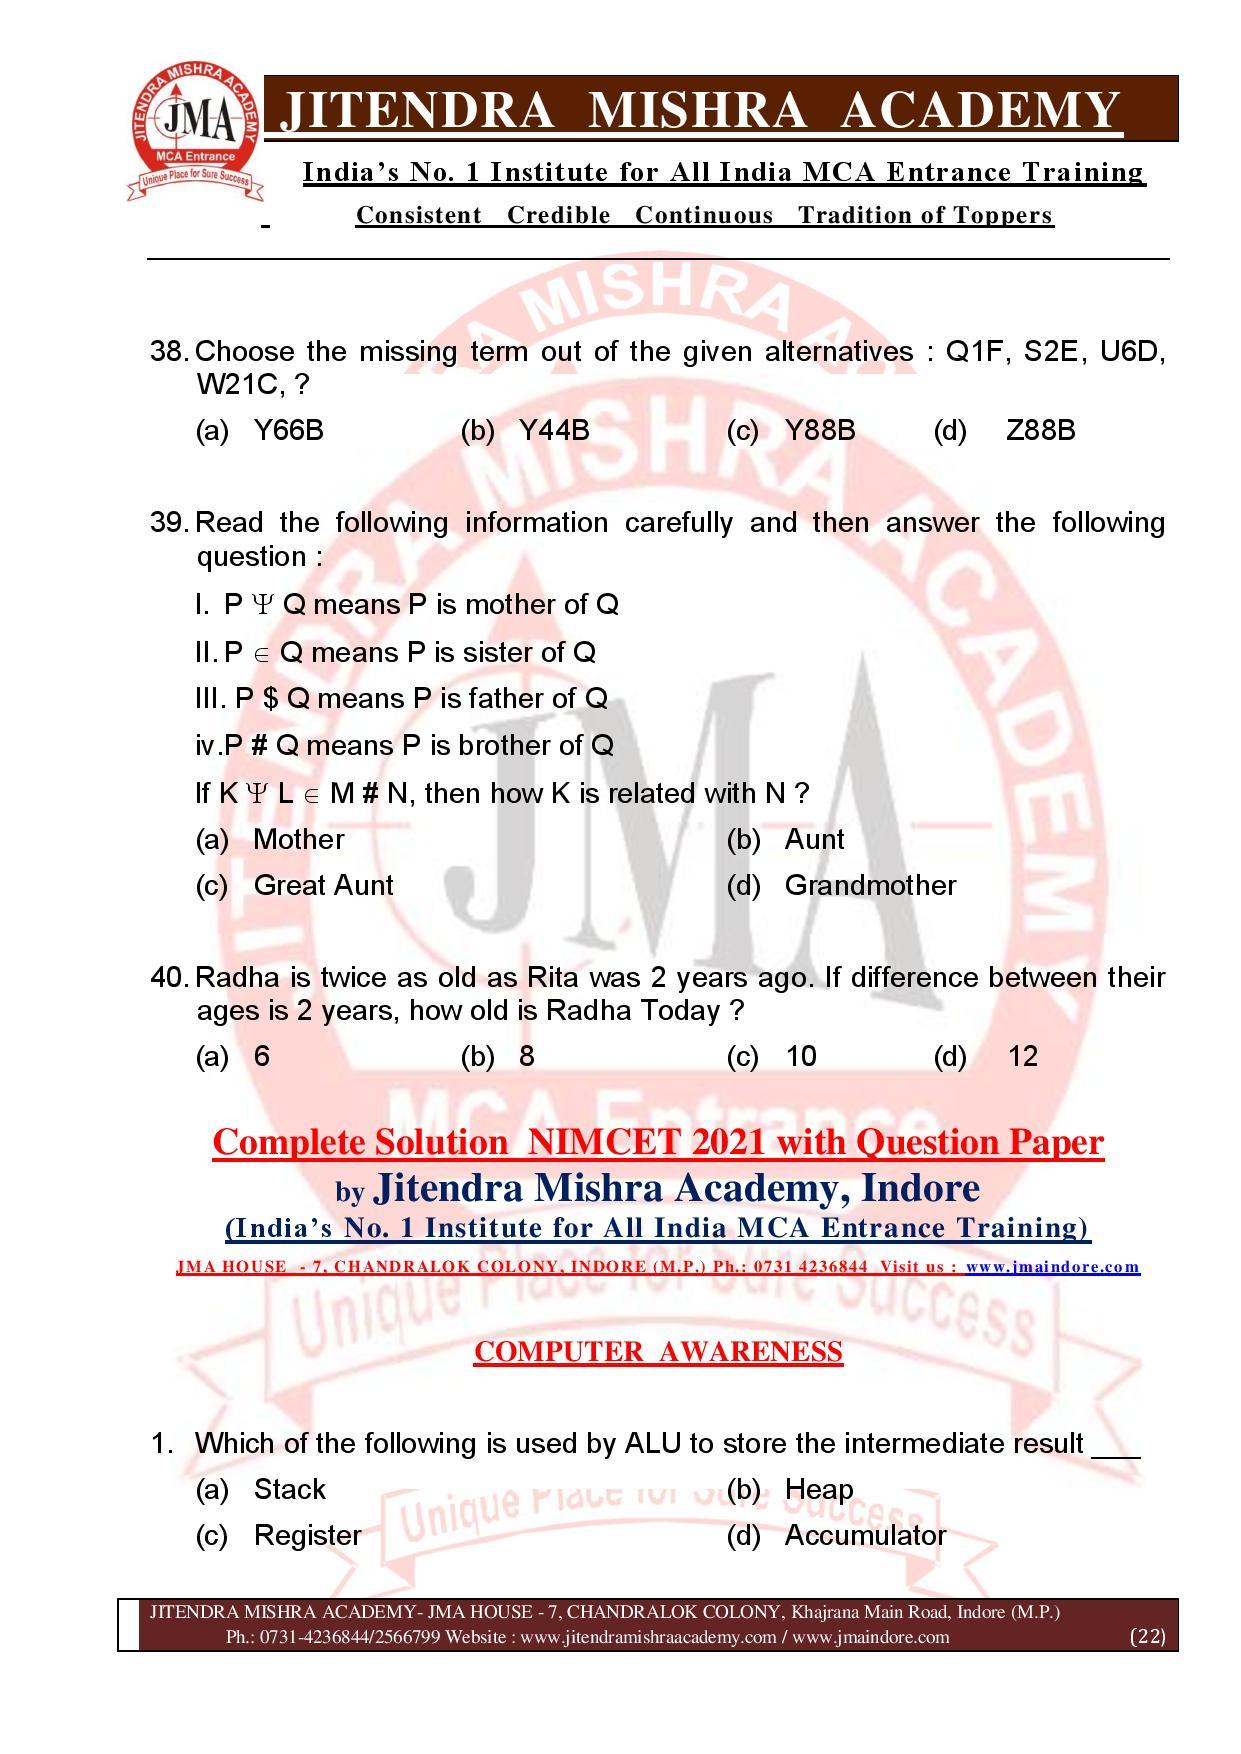 NIMCET 2021 QUESTION PAPER (F)-page-022